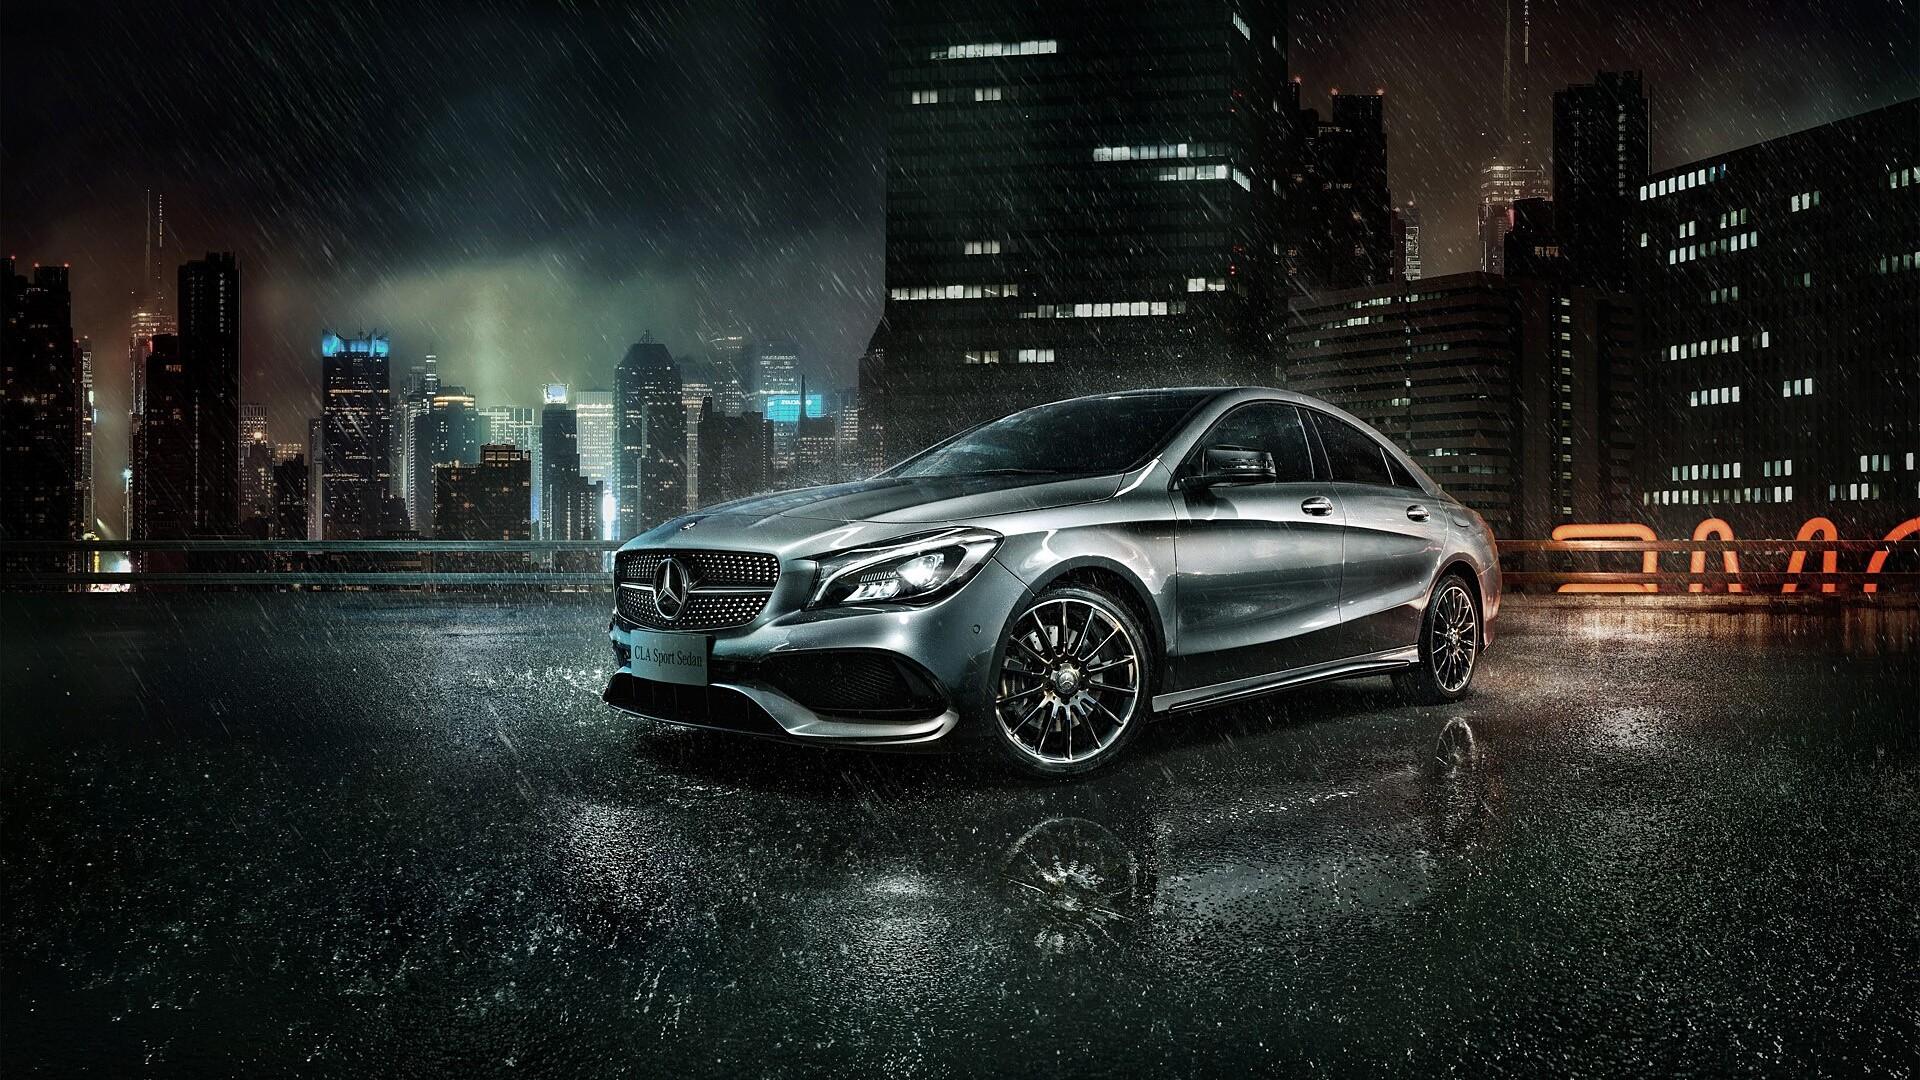 1920x1080 Mercedes Benz CLA Laptop Full HD 1080P HD 4k ...